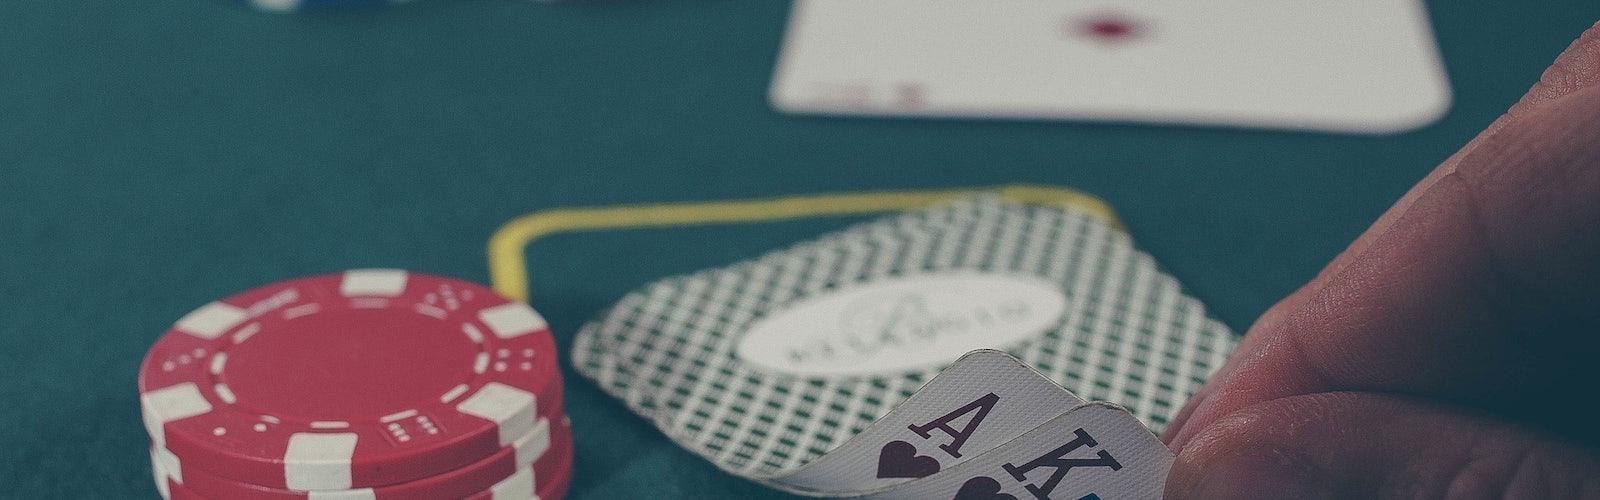 Online gambling legal in India